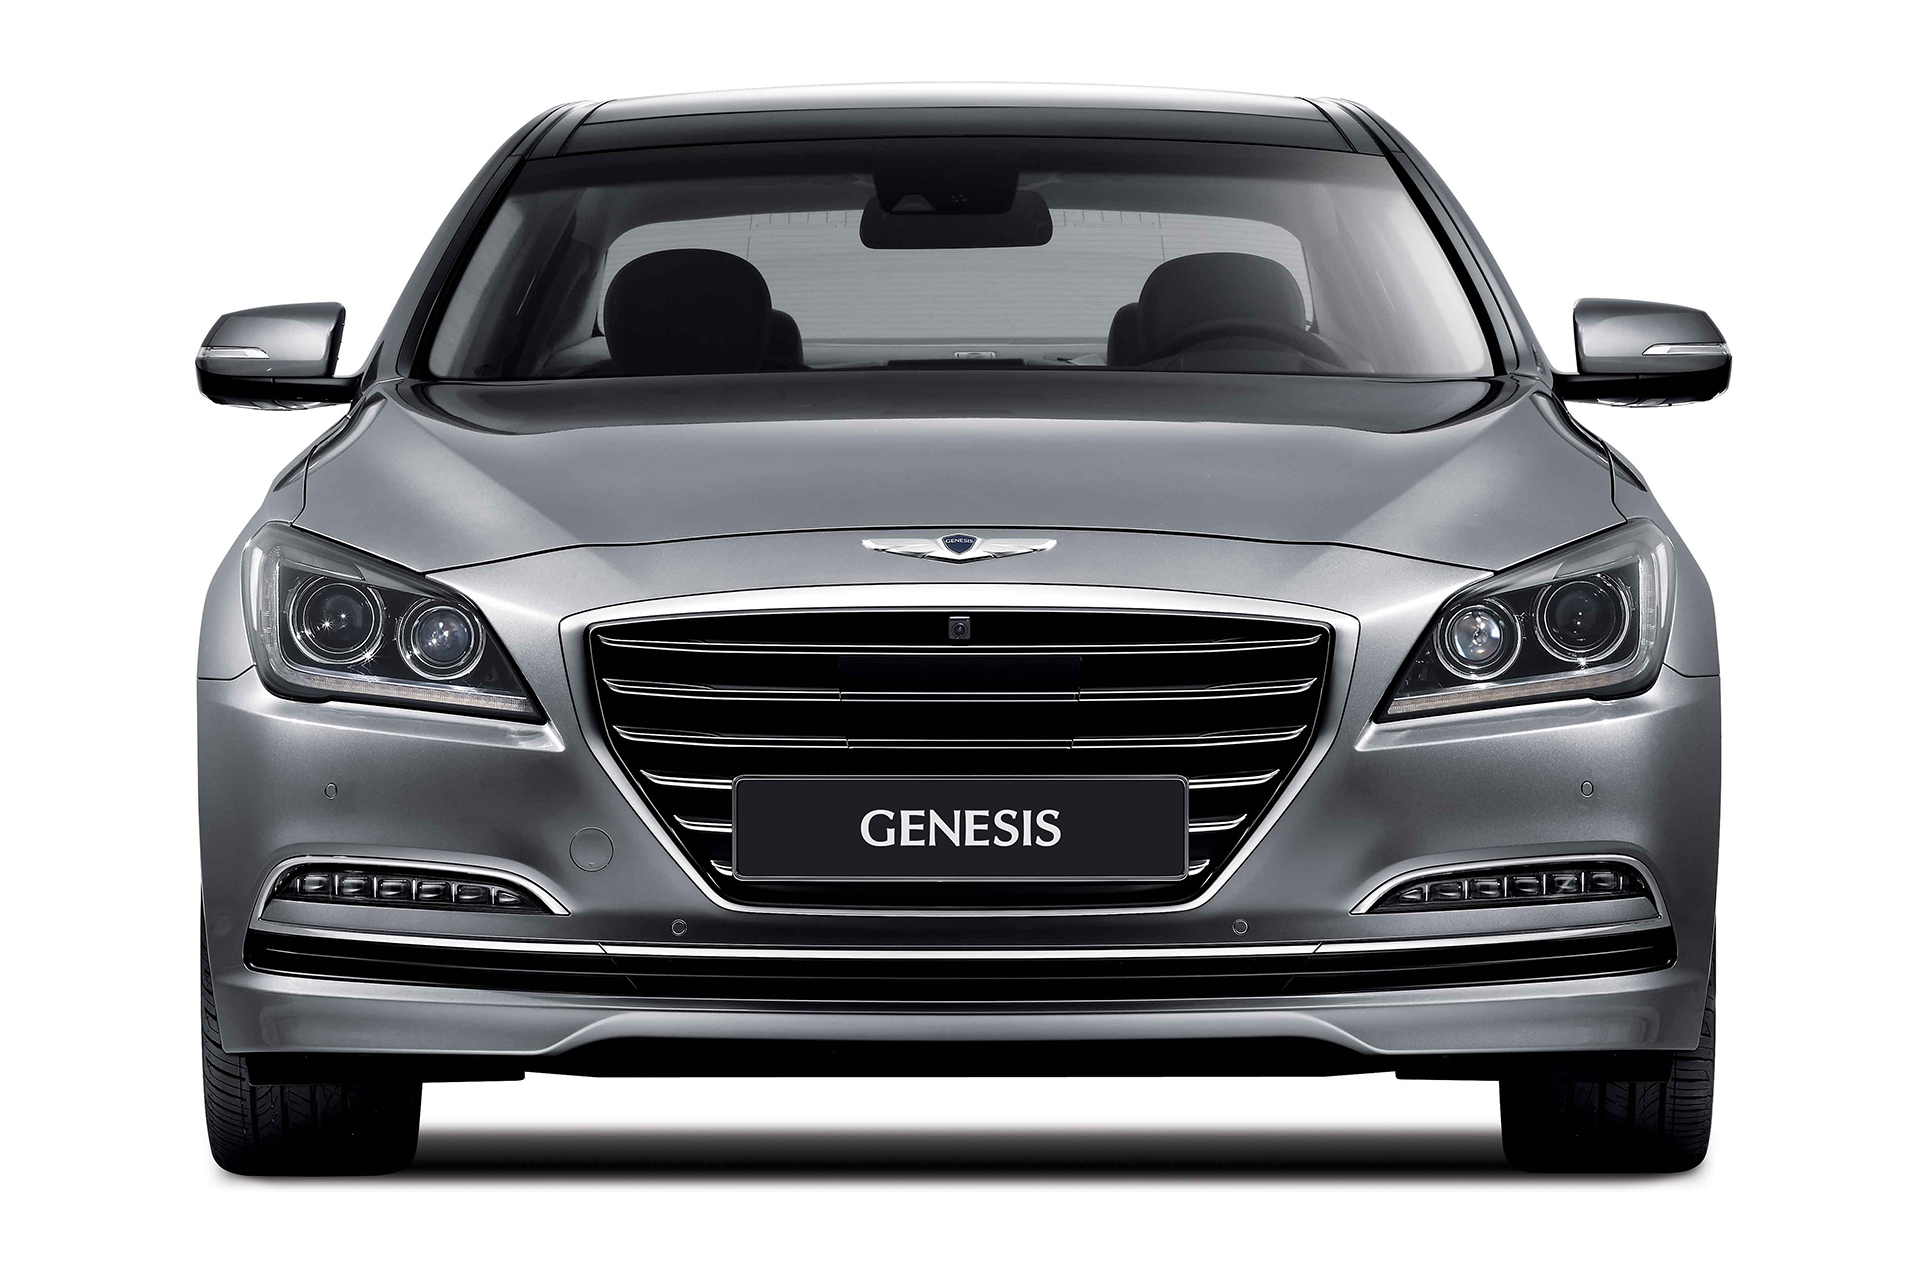 Genesis G90 - 2016 - front / avant